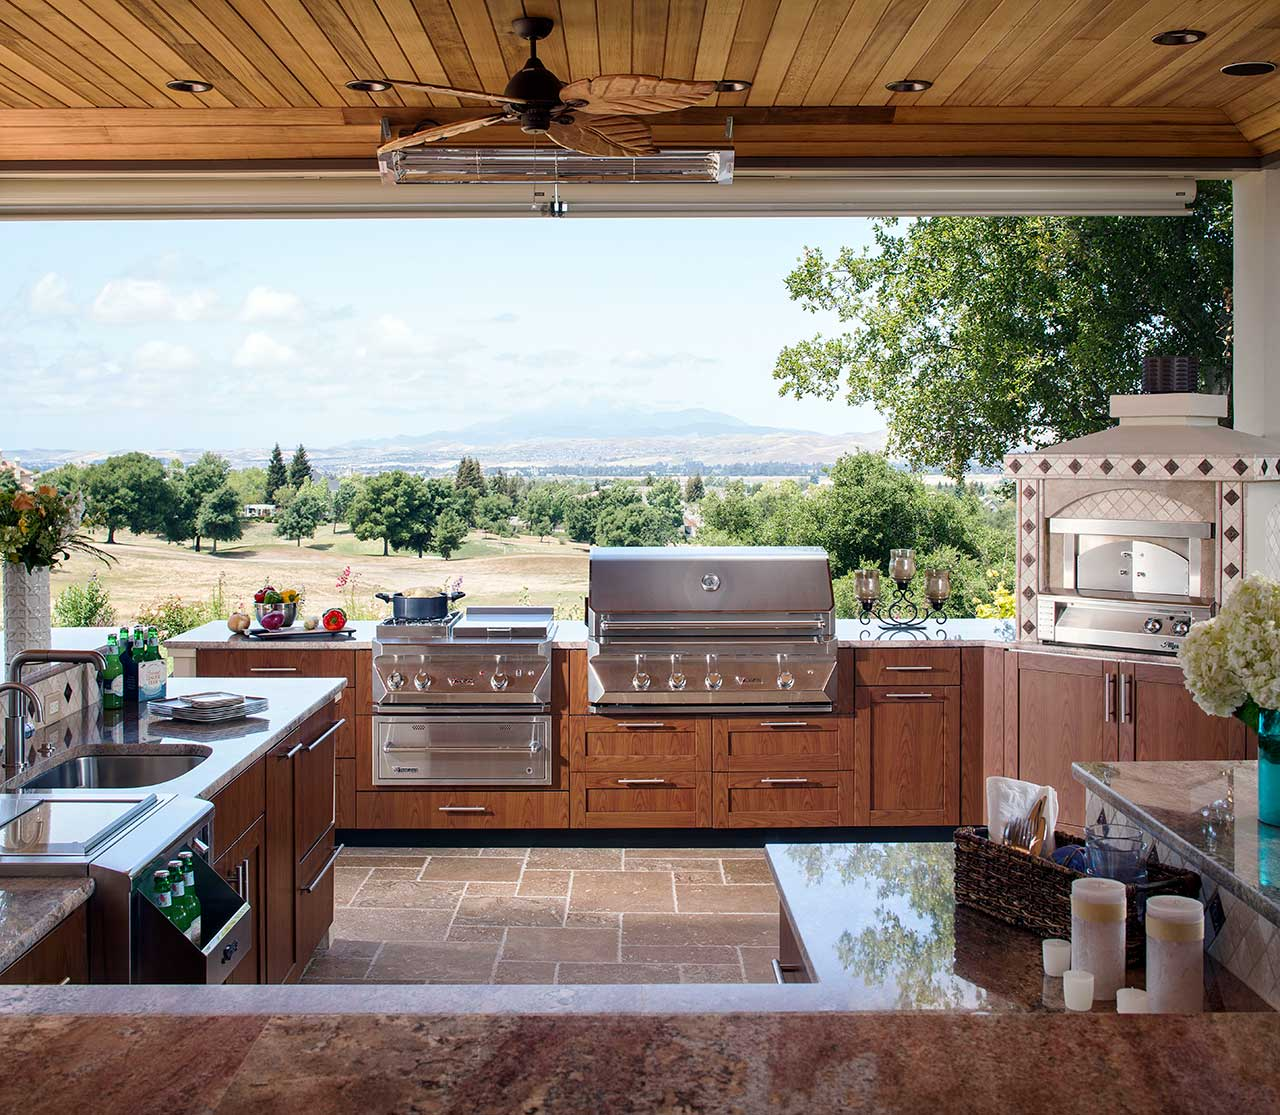 brown jordan outdoor kitchens home depot kohler kitchen sinks ideas